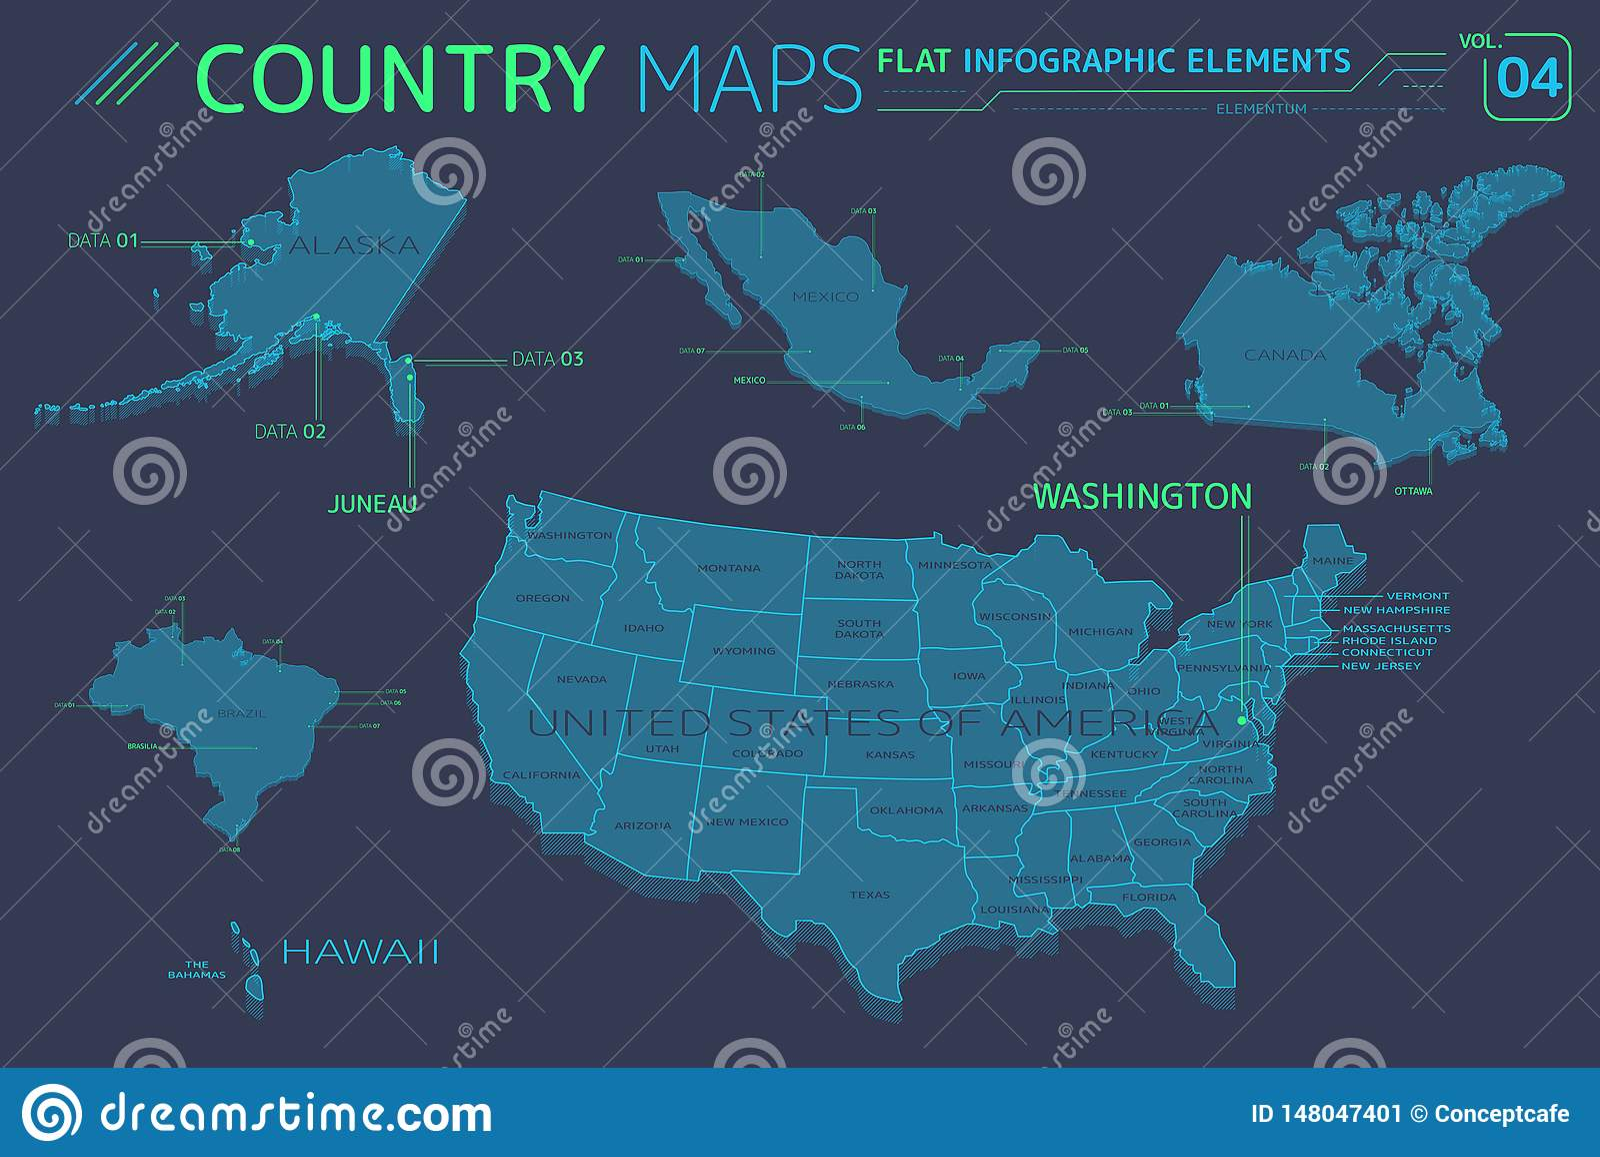 United States Of America, Alaska, Hawaii, Mexico, Canada And ...